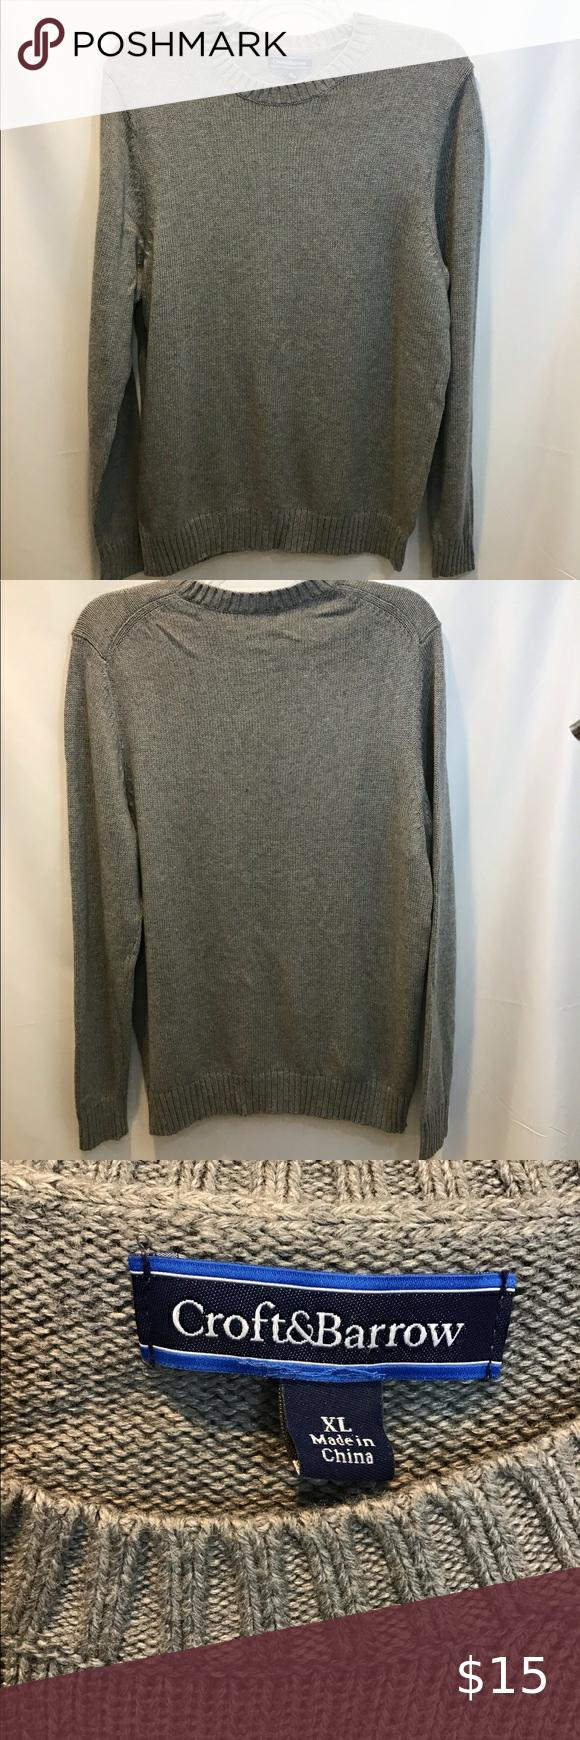 Croft Barrow Gray Pullover Sweater Xl Croft Barrow Men S Gray Chunk Knitted Pullover Sweater Size Xl Grey Pullover Grey Pullover Sweater Pullover Sweaters [ 1740 x 580 Pixel ]